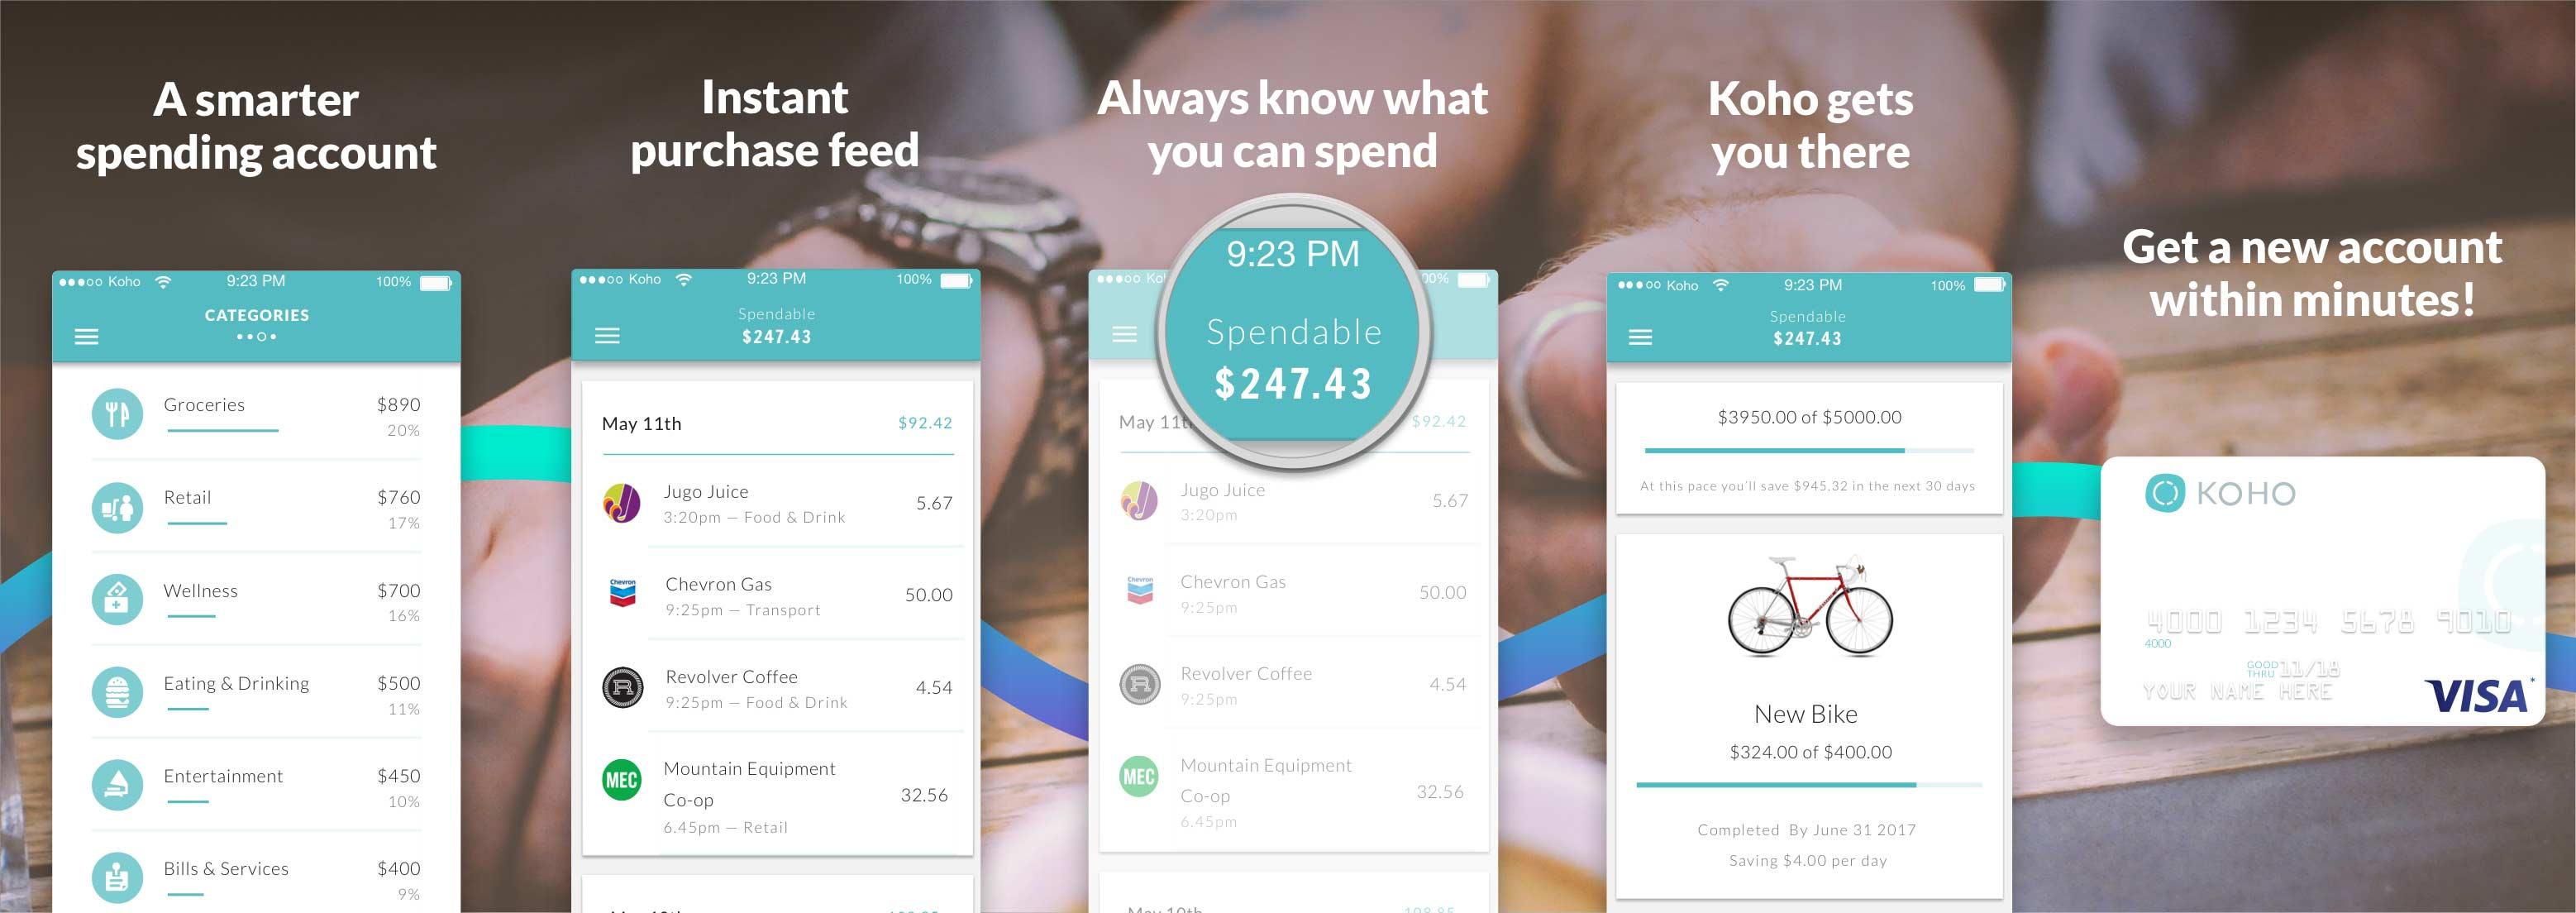 Koho App Store Image